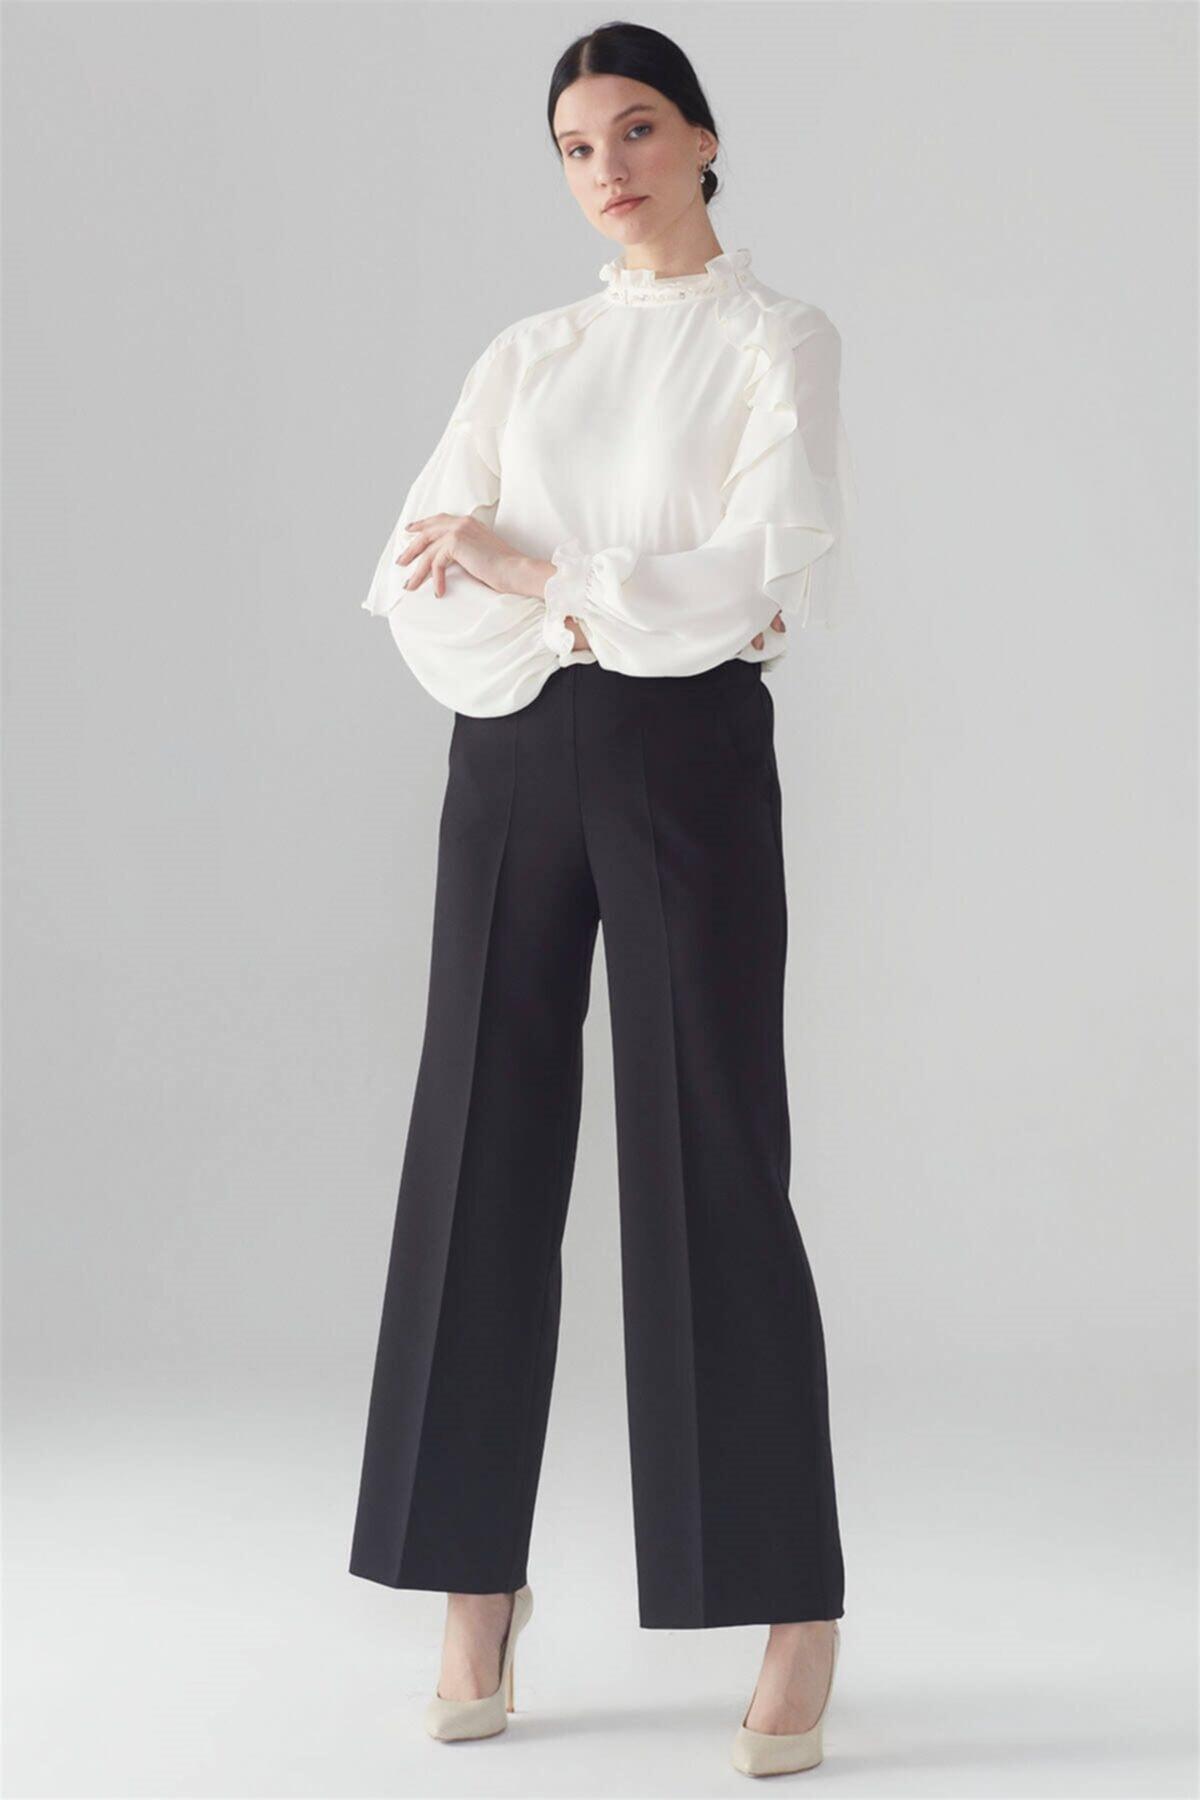 Bel Lastik Detaylı Bol Paça Siyah Pantolon P-0102